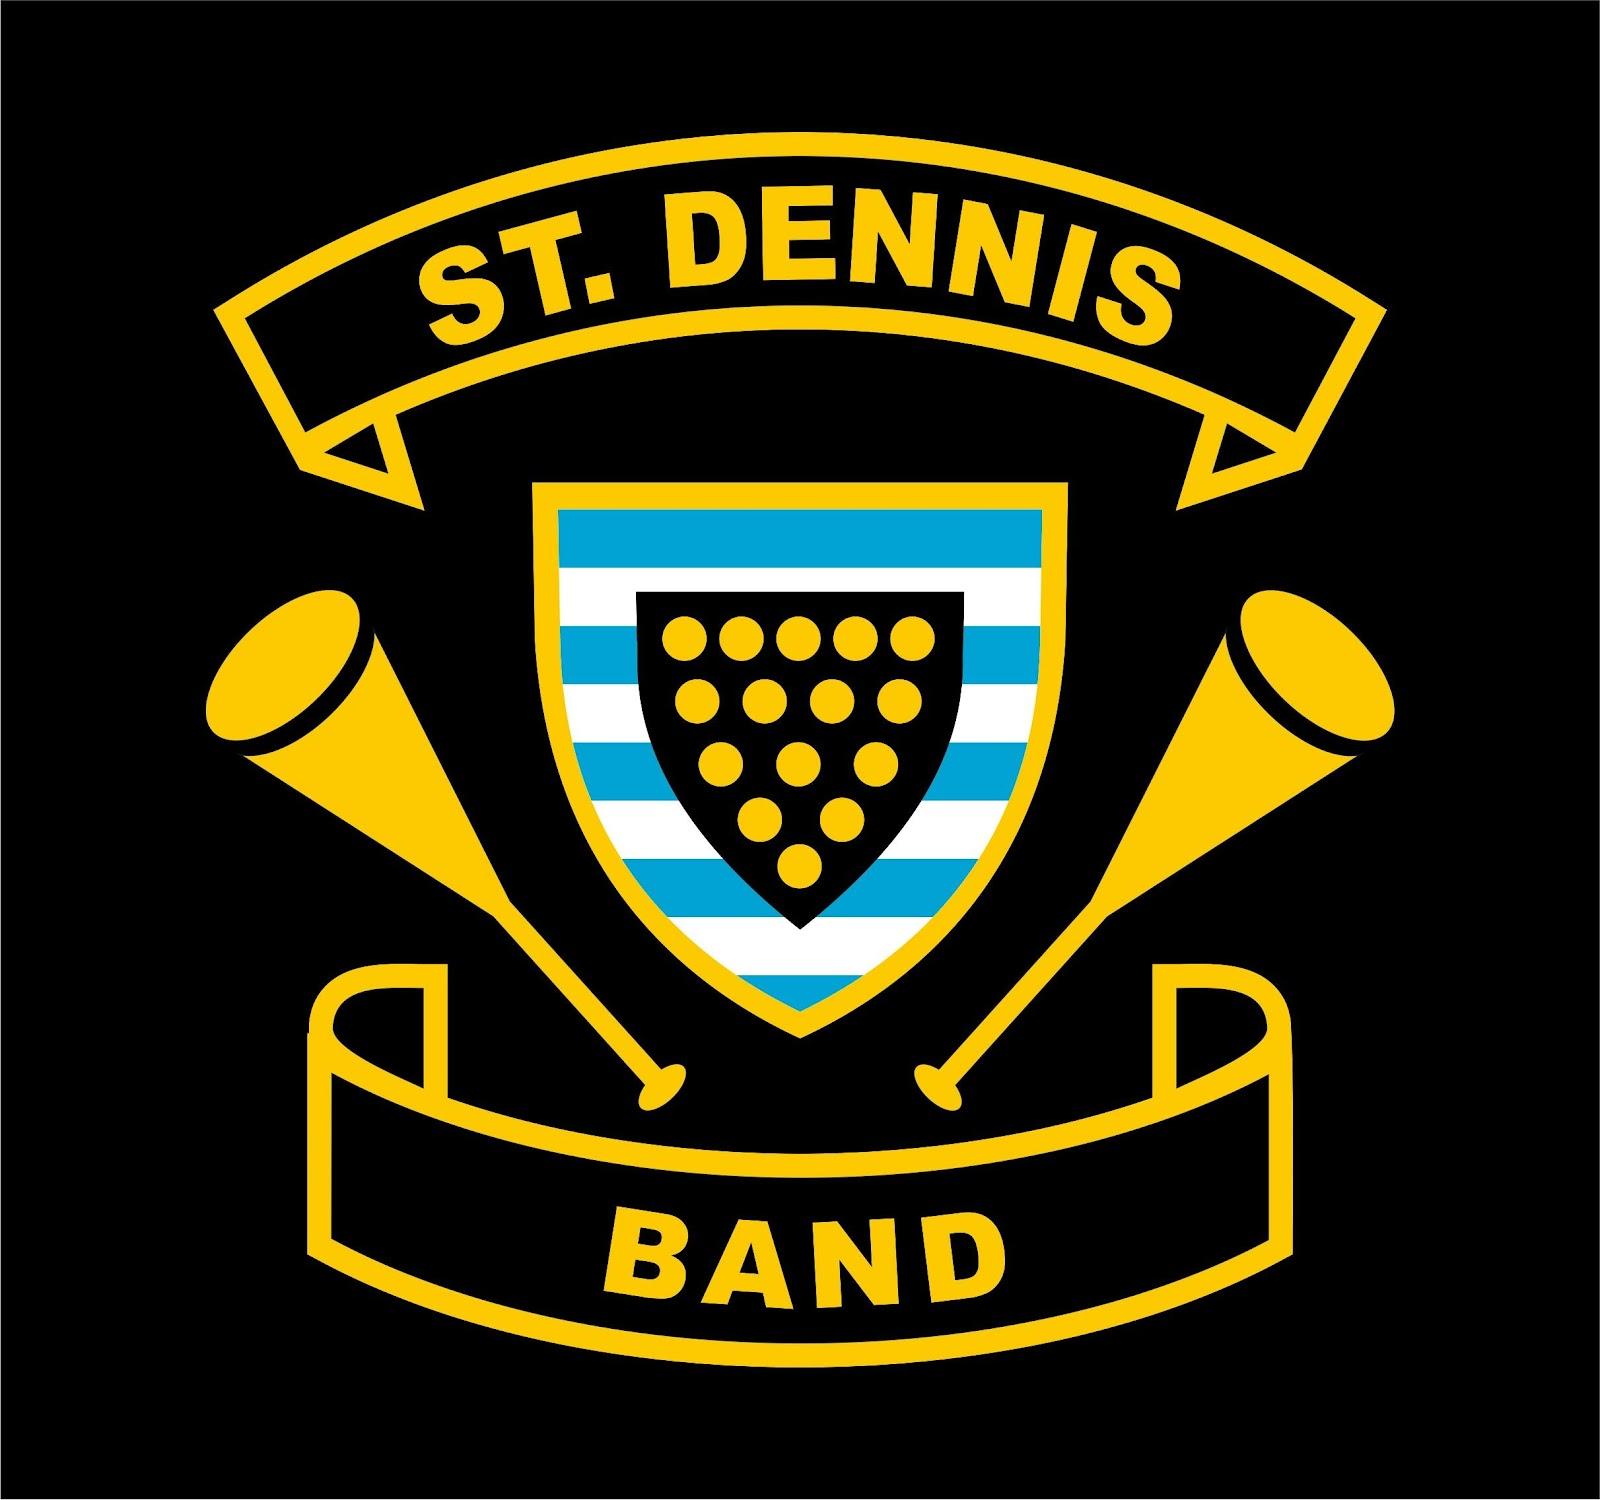 St Dennis Band Logo 2015.jpg